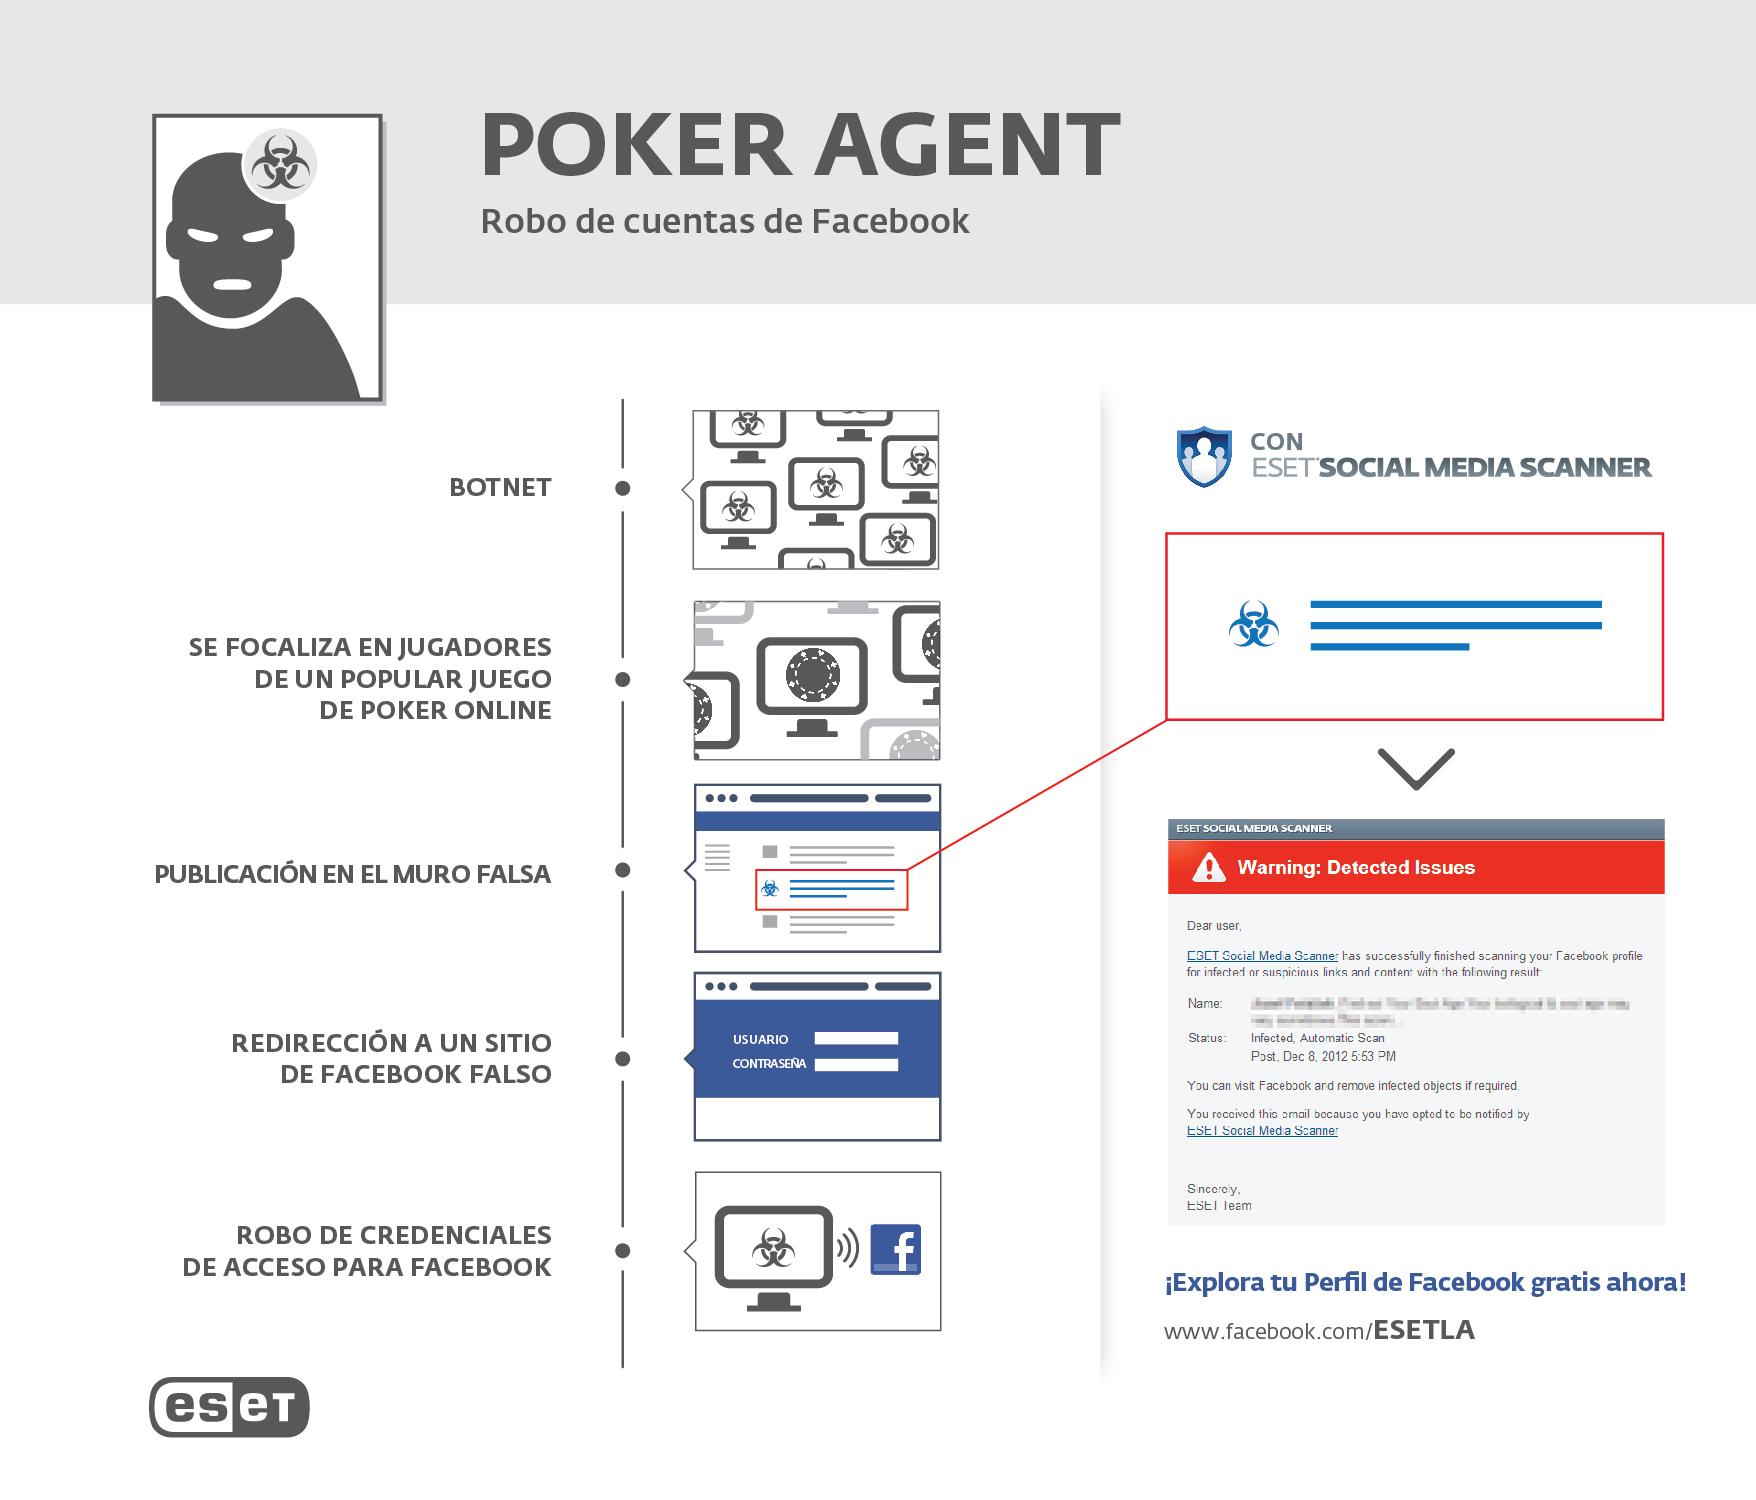 8_eset_nod32_PokerAgent_infographic